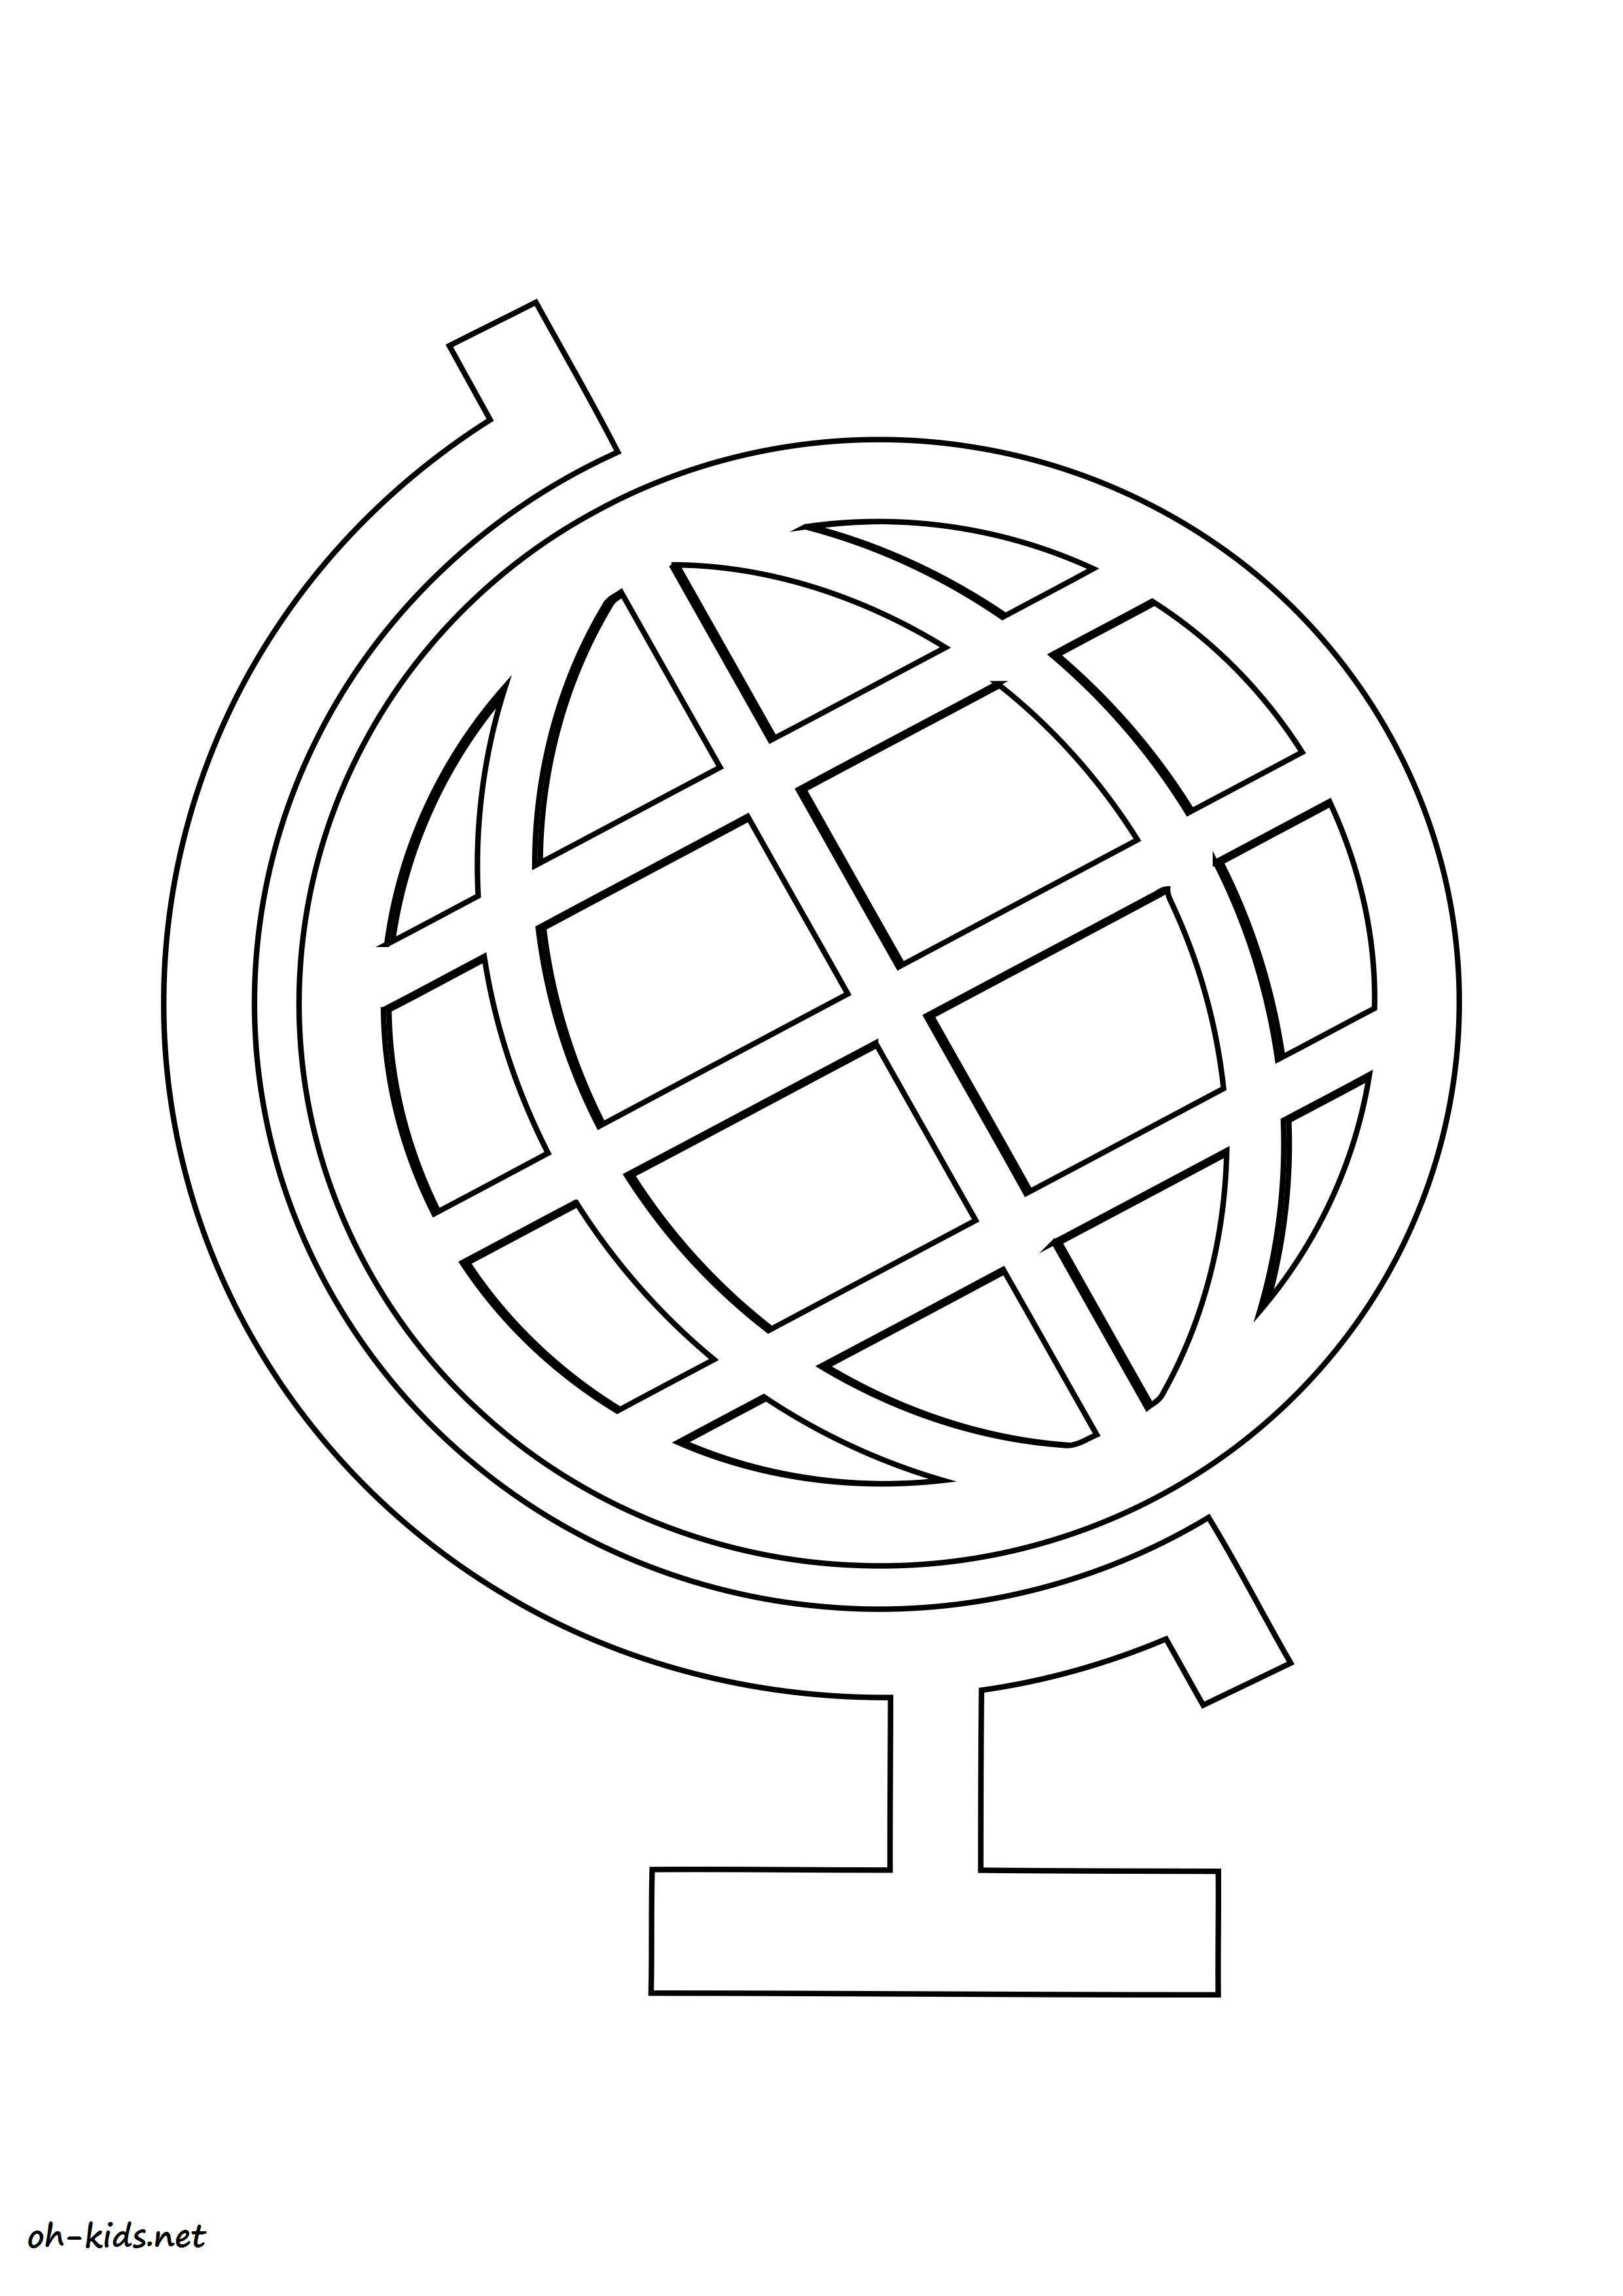 Image de globe terrestre a dessiner - Dessin #1186